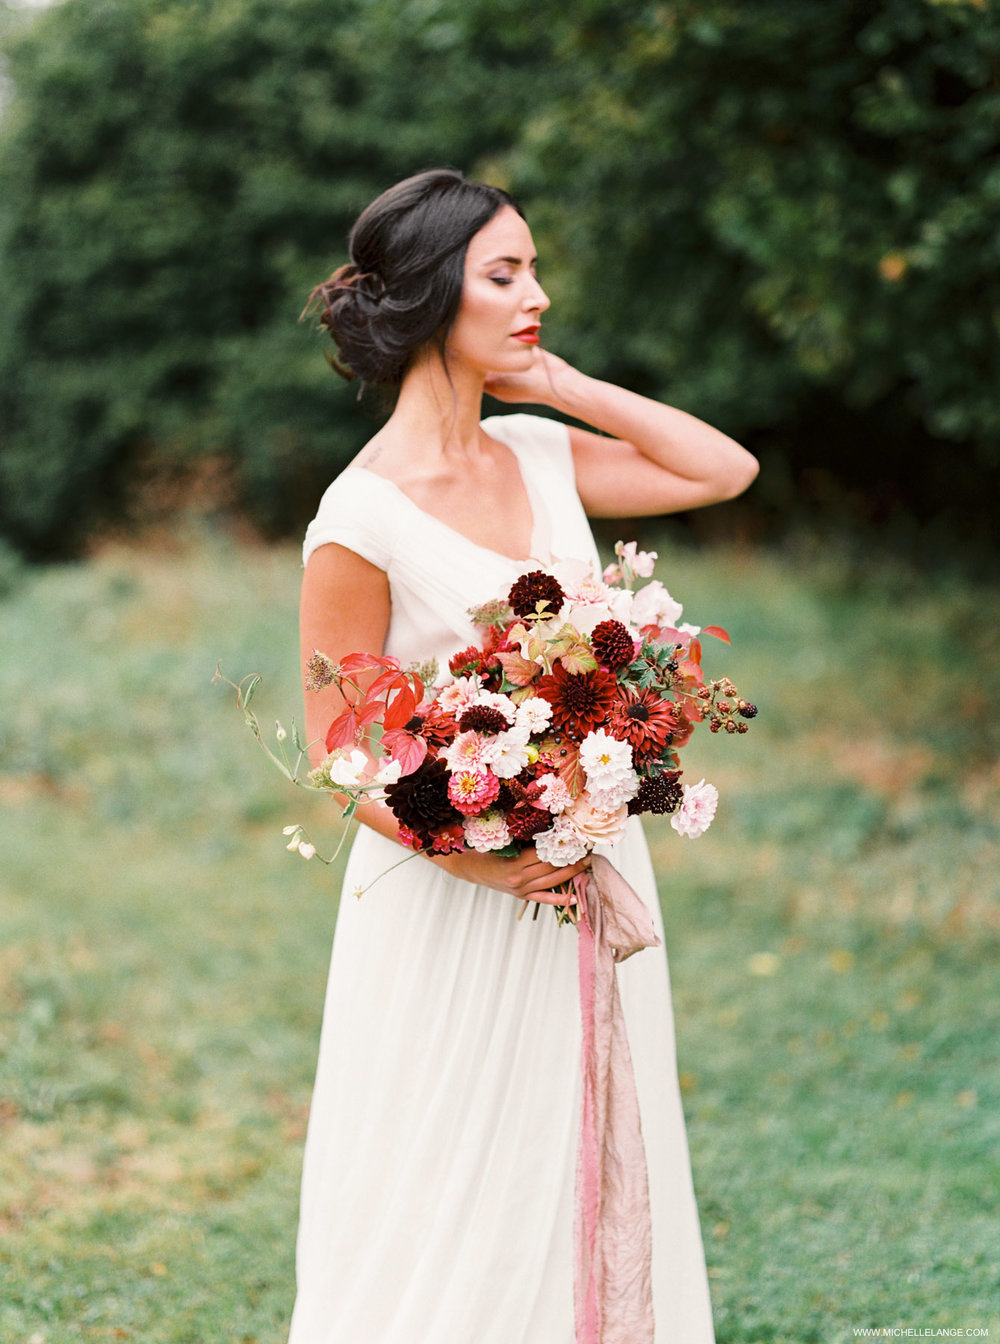 NJ Wedding and Editorial Photographer with Fleuropean, lovebirds.de and Victoria Ruesche